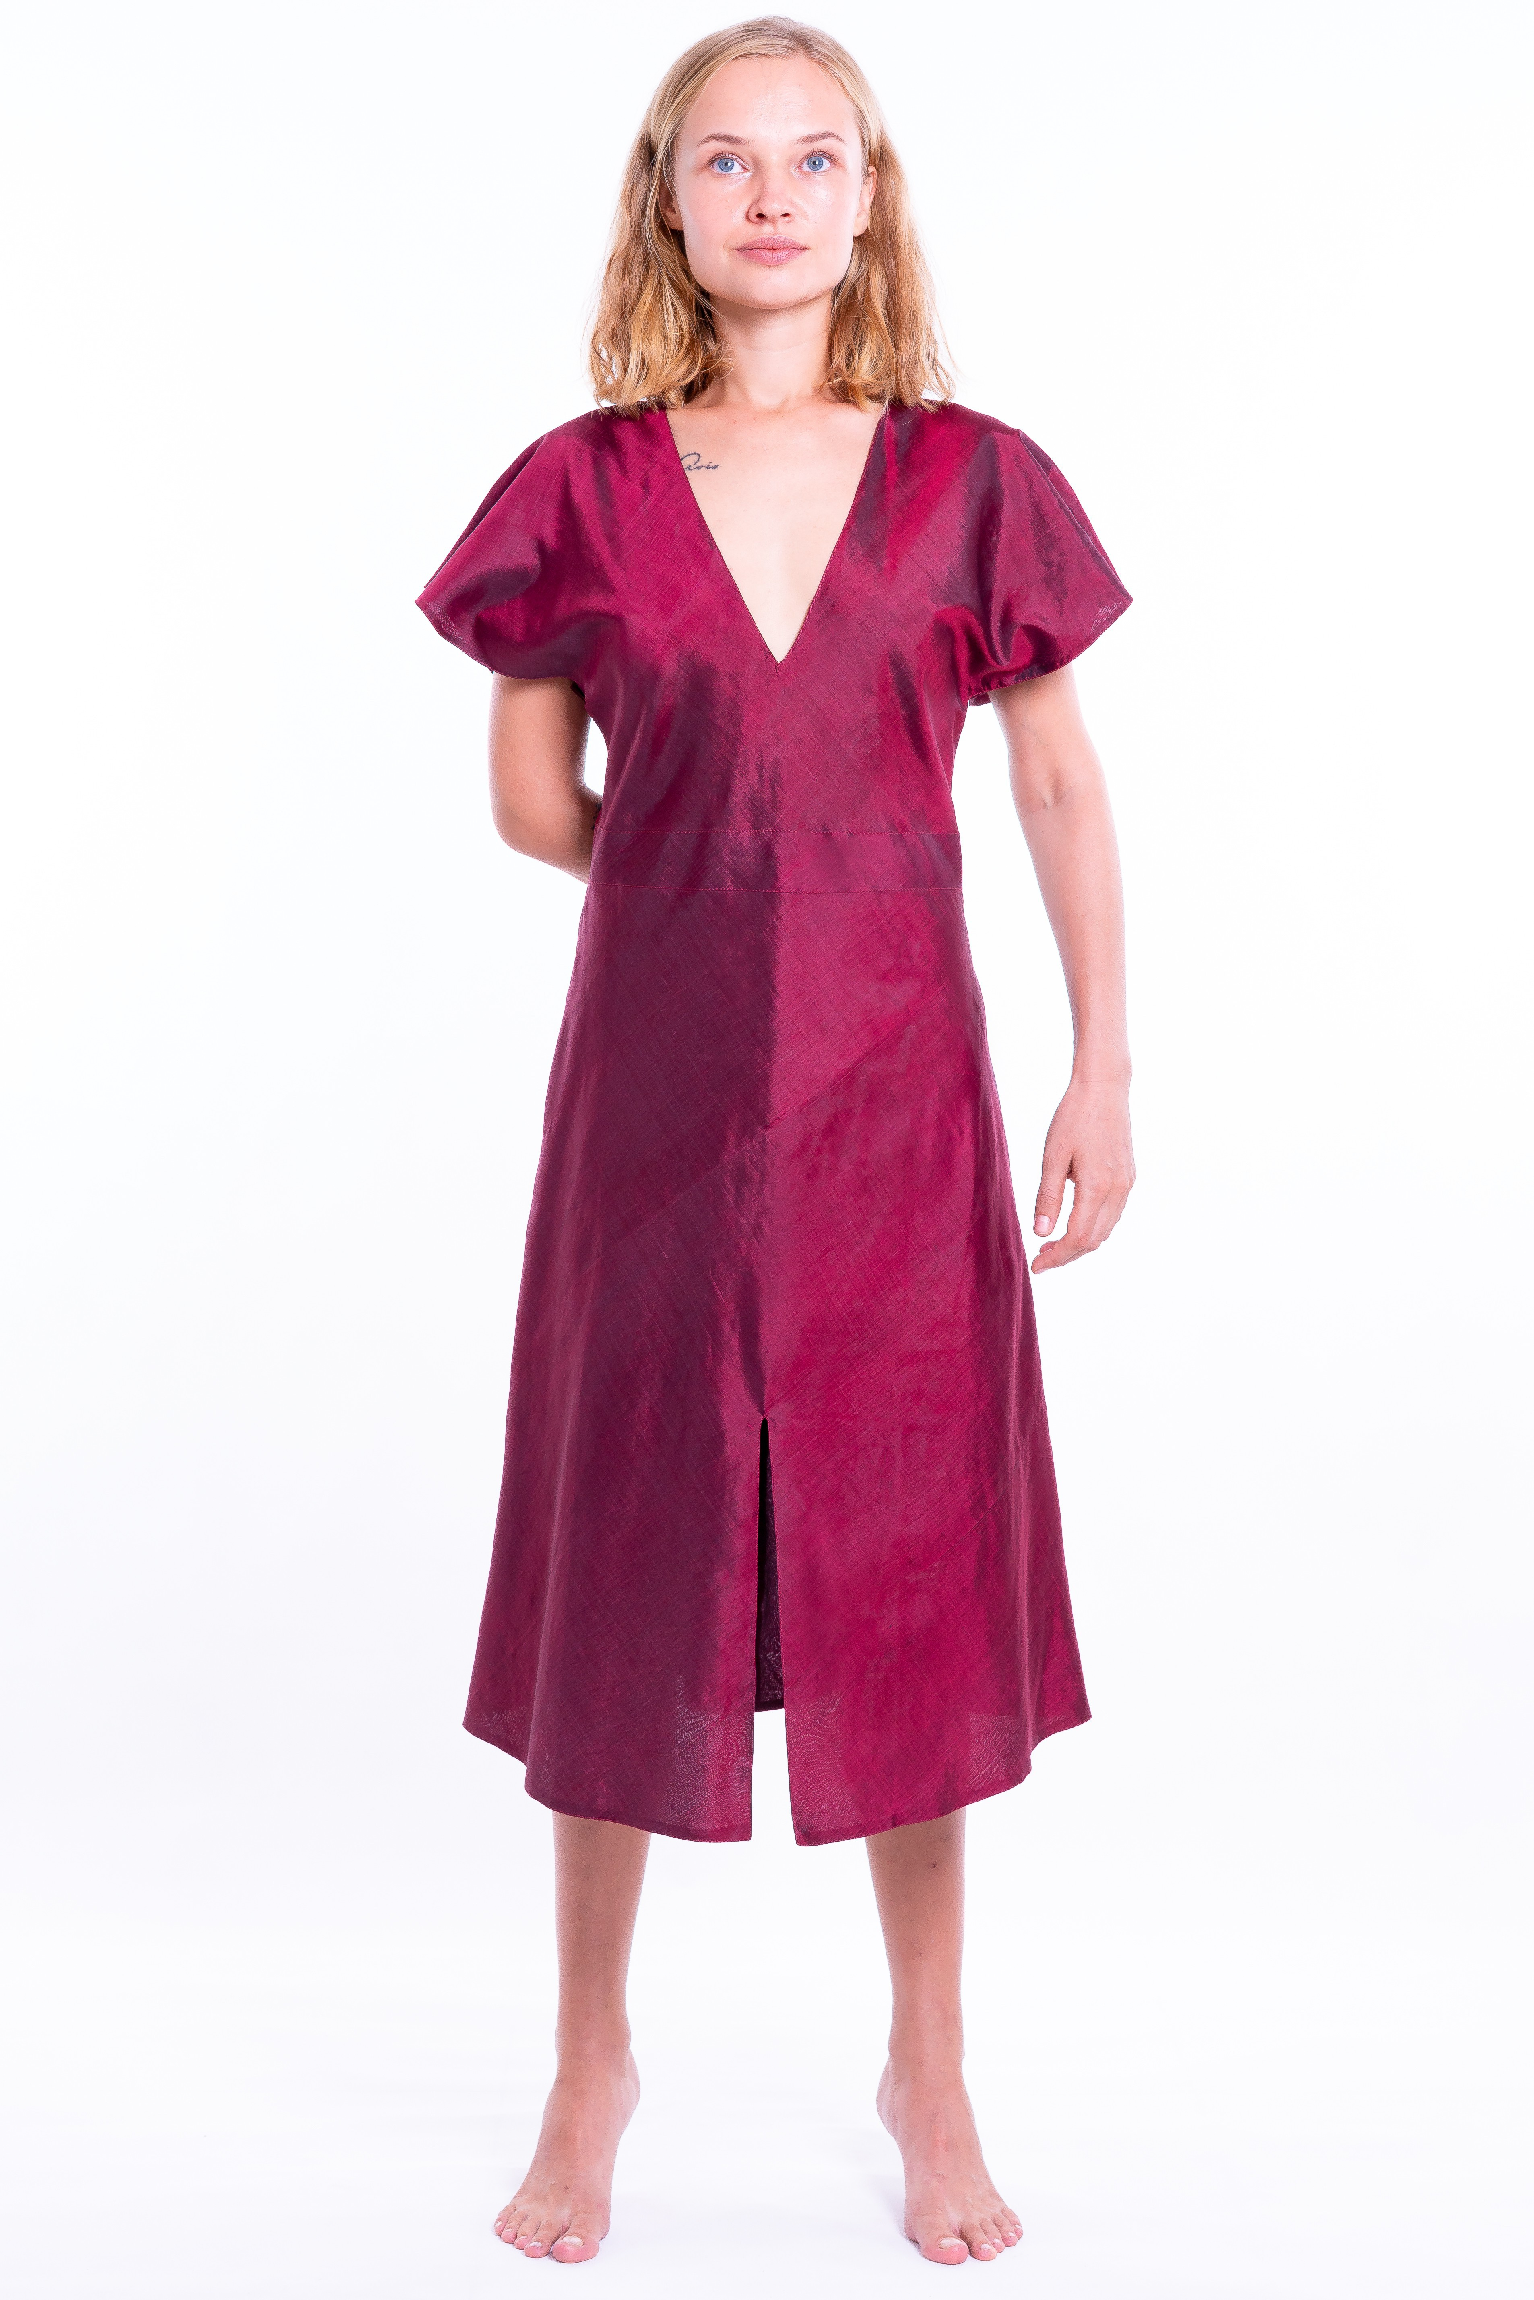 red natural silk dress, fully lined, deep V neckline, front